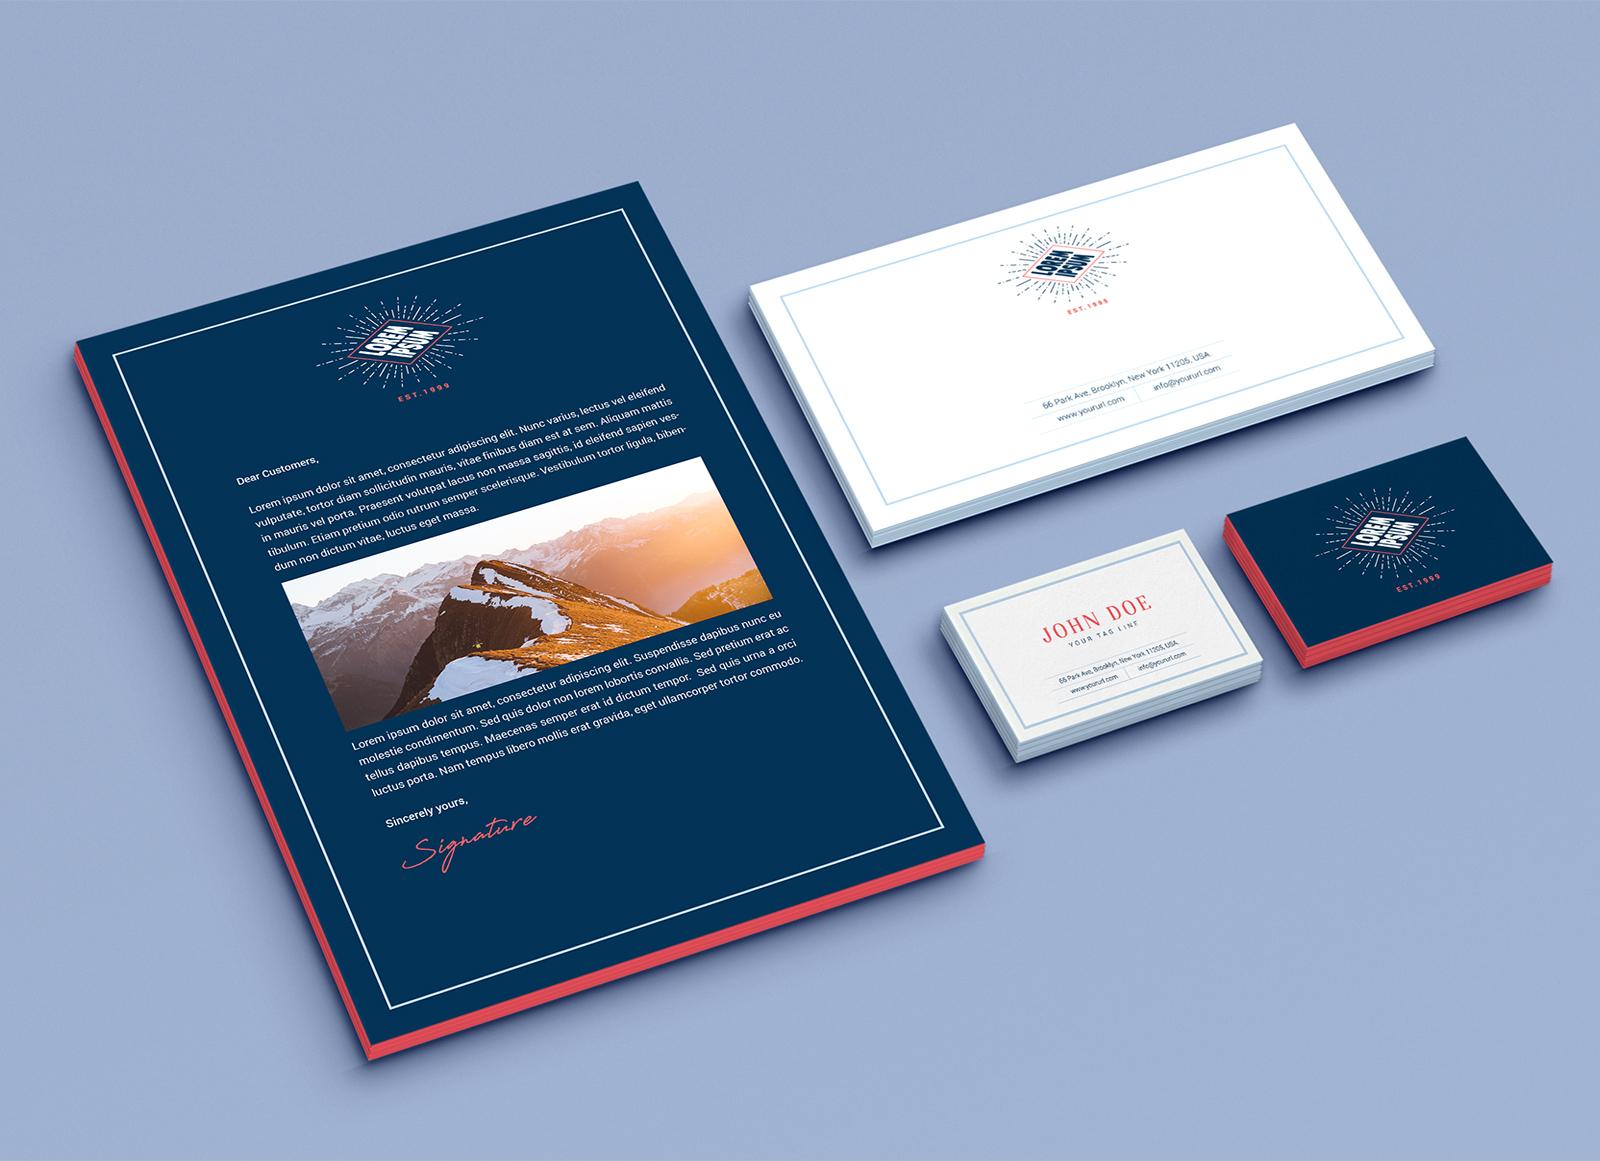 Free-Essential-Stationery-Branding-Mockup-PSD-2